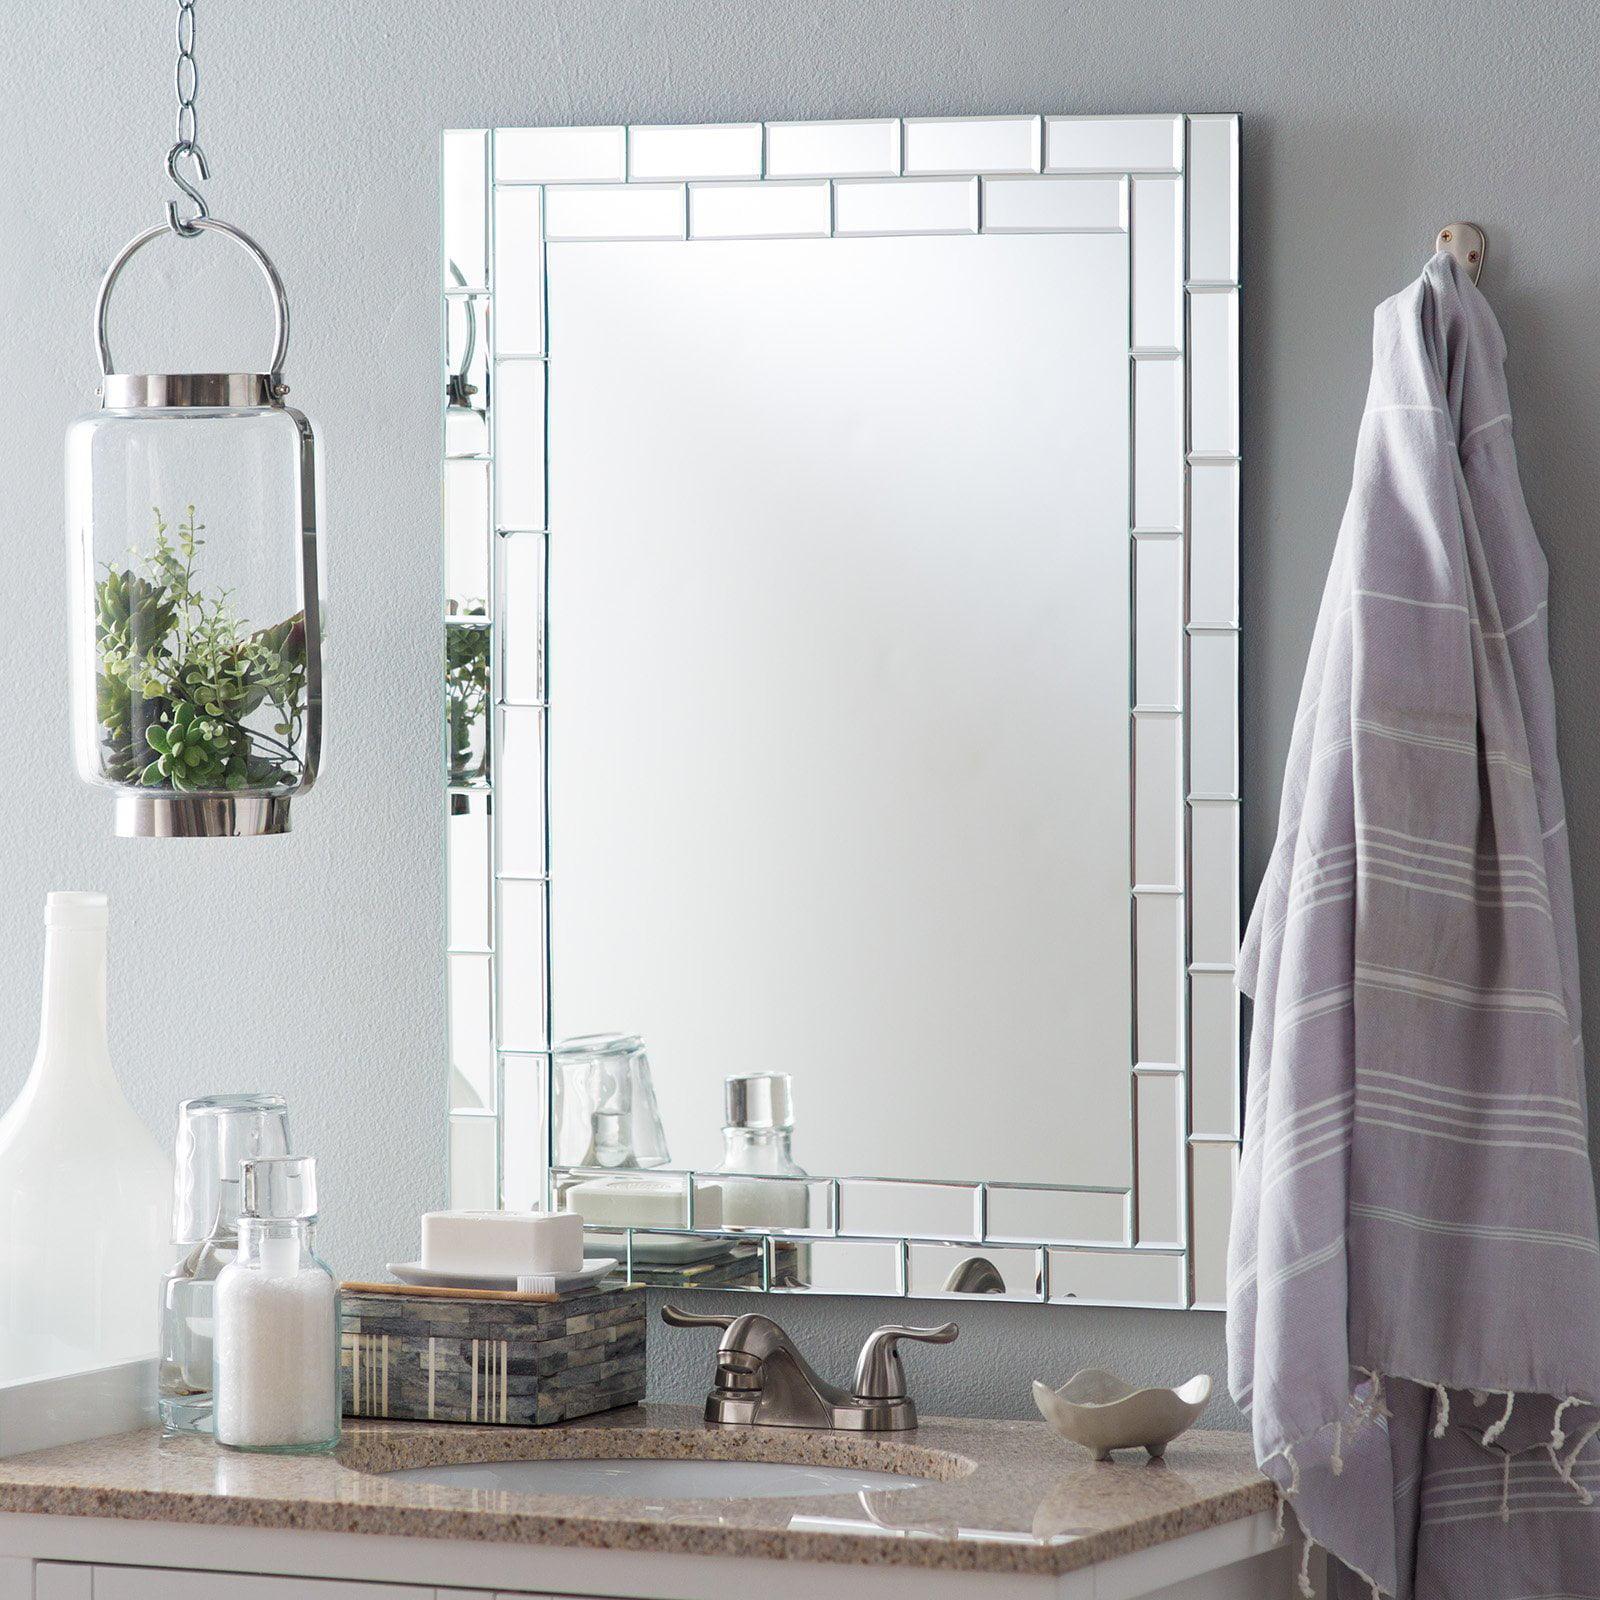 Decor Wonderland Grand Street Modern Bathroom Mirror 23.6W x 31.5H in. by